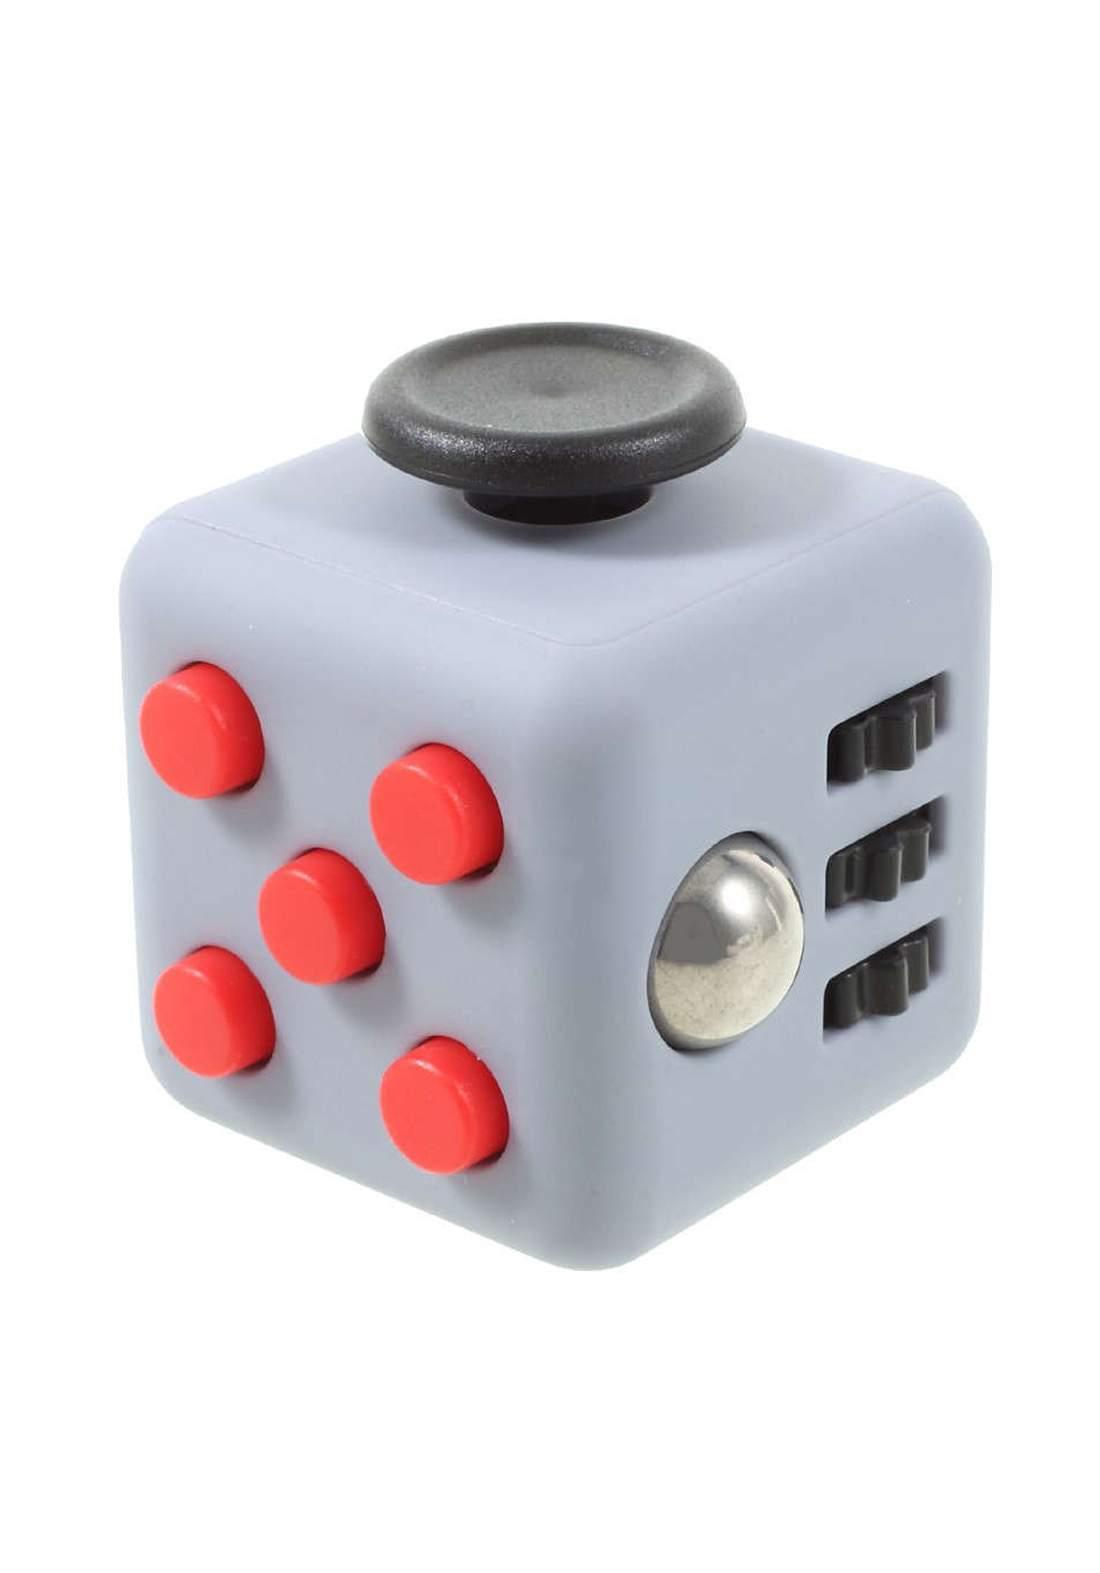 Fidget Toy Cube Stress Anxiety Relief لعبة المكعب معالج الملل